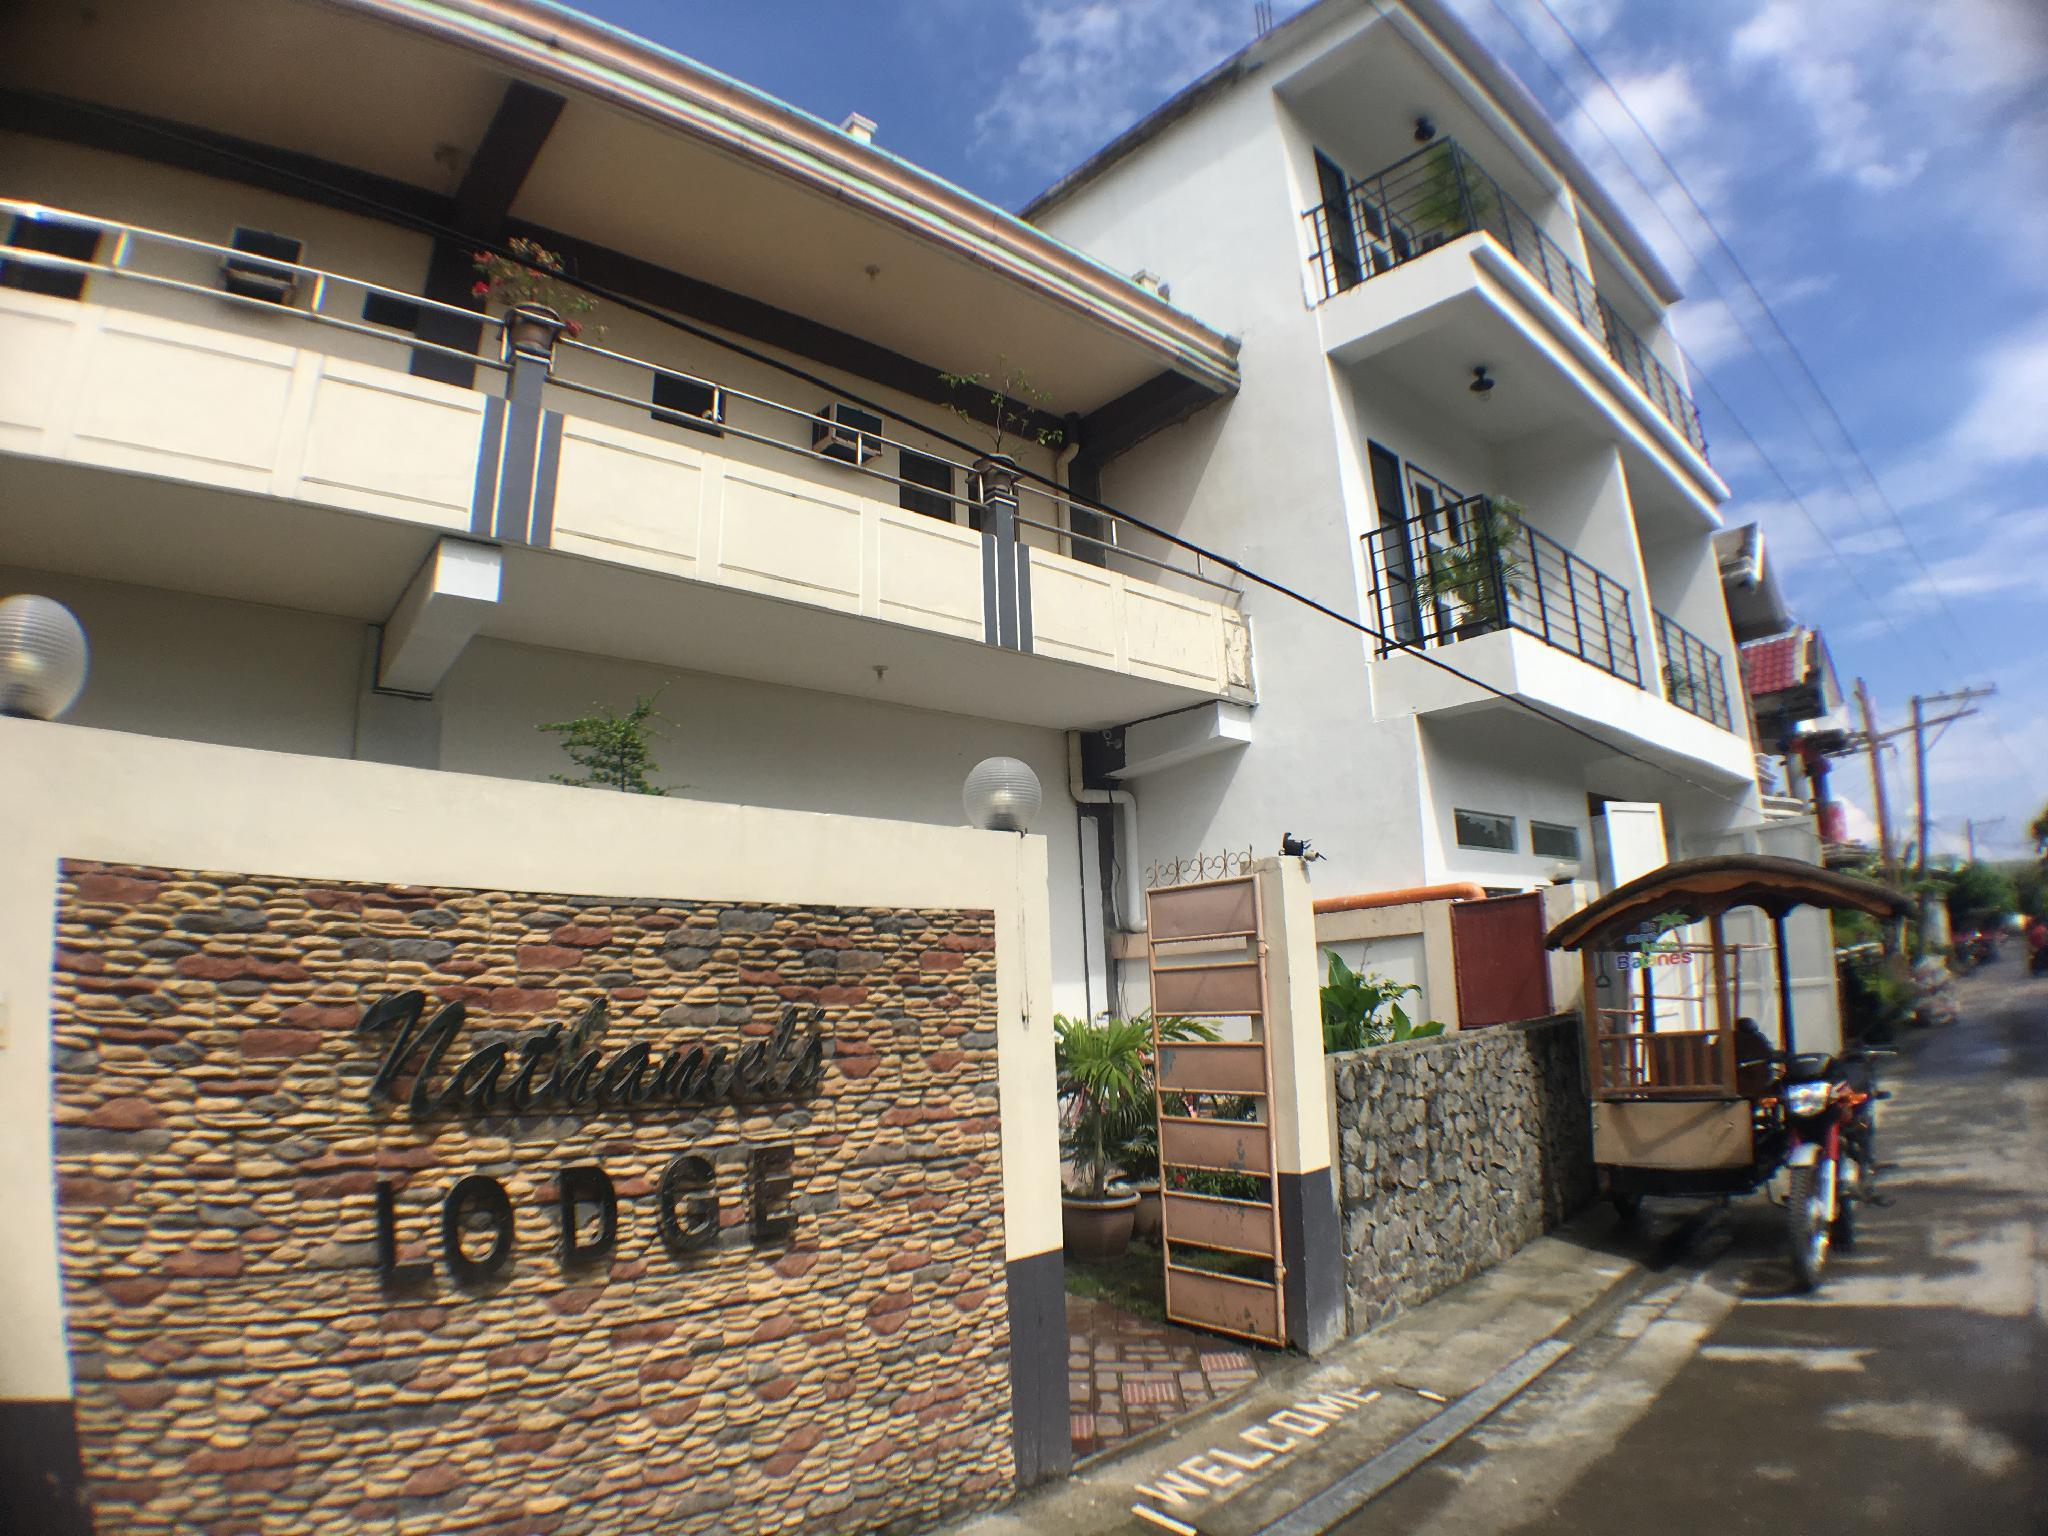 Nathaniel's Lodge